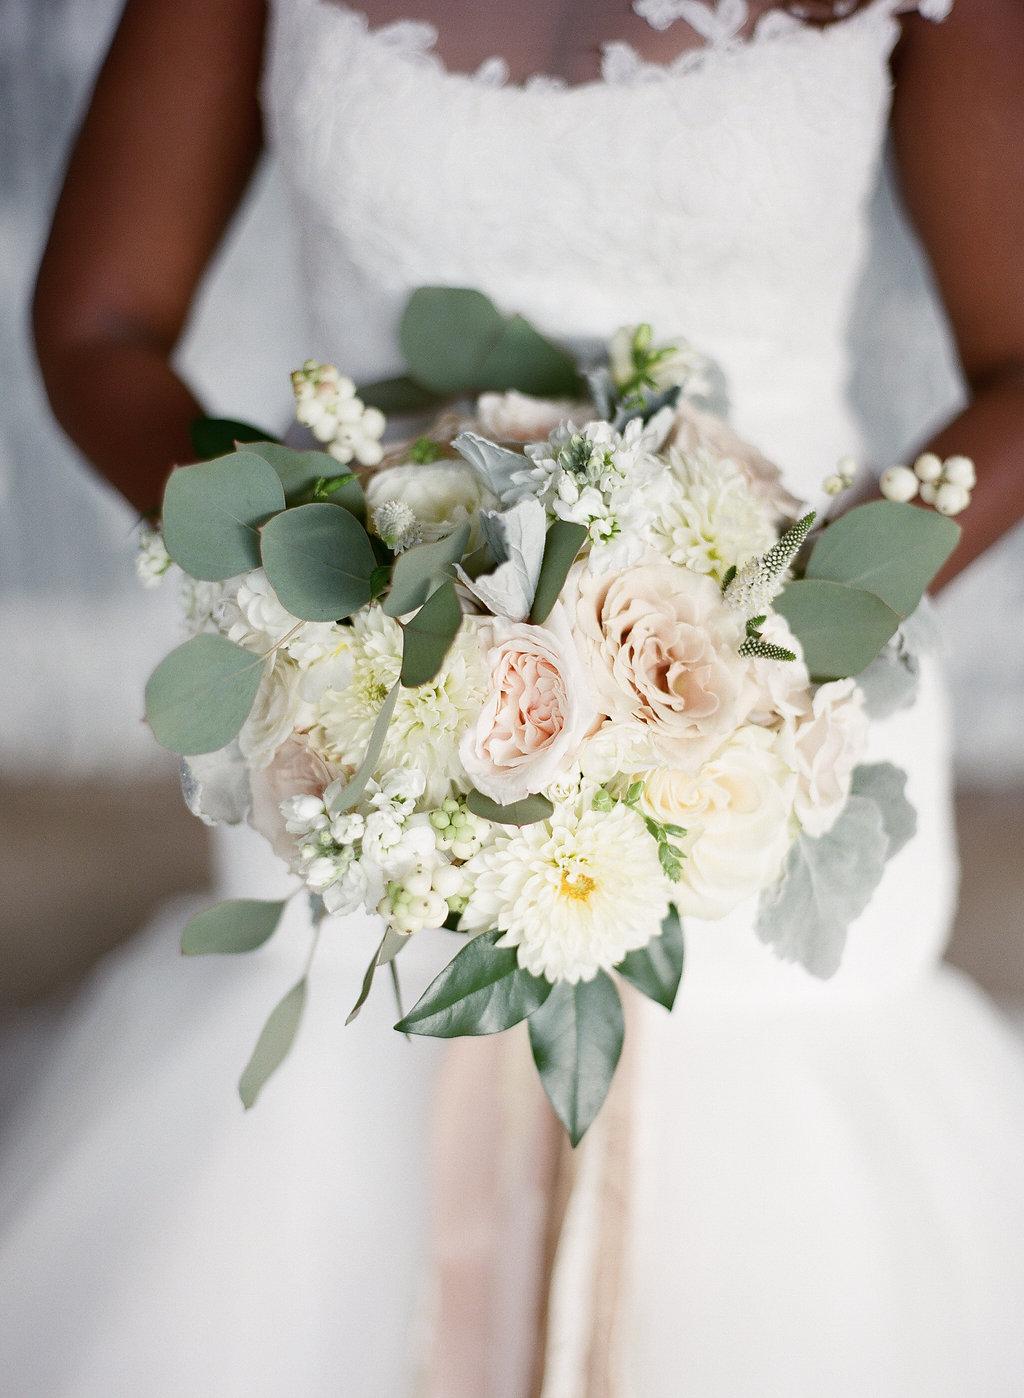 Virginia_Wedding_Photographer_Kristen_Lynne_Photography-143.jpg